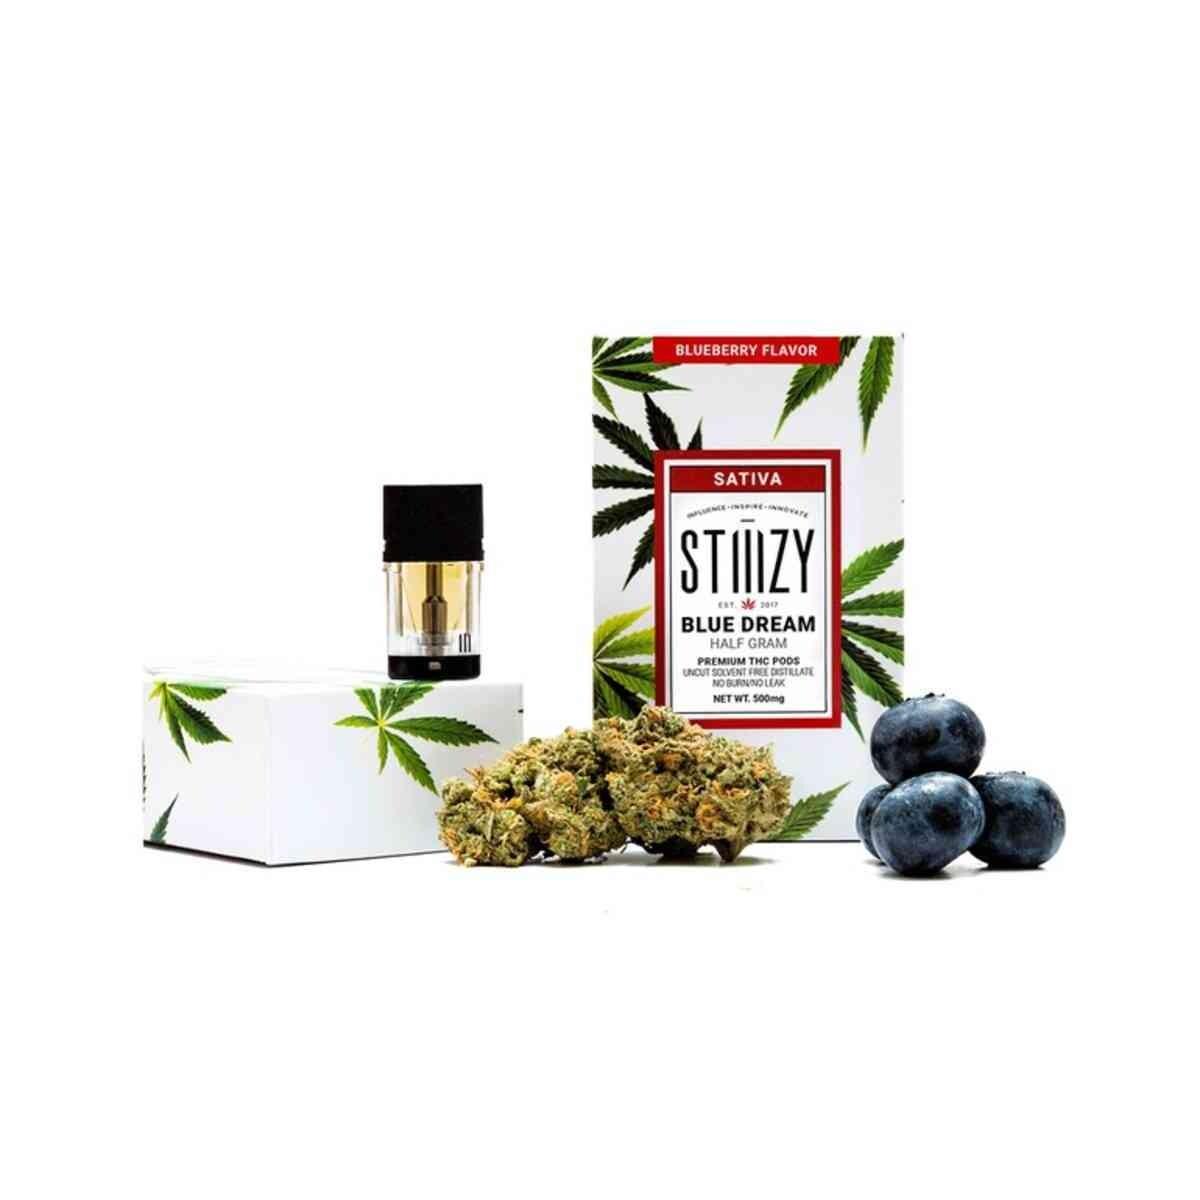 STIIIZY Blue Dream - Blueberry Premium THC 1 GRAM POD